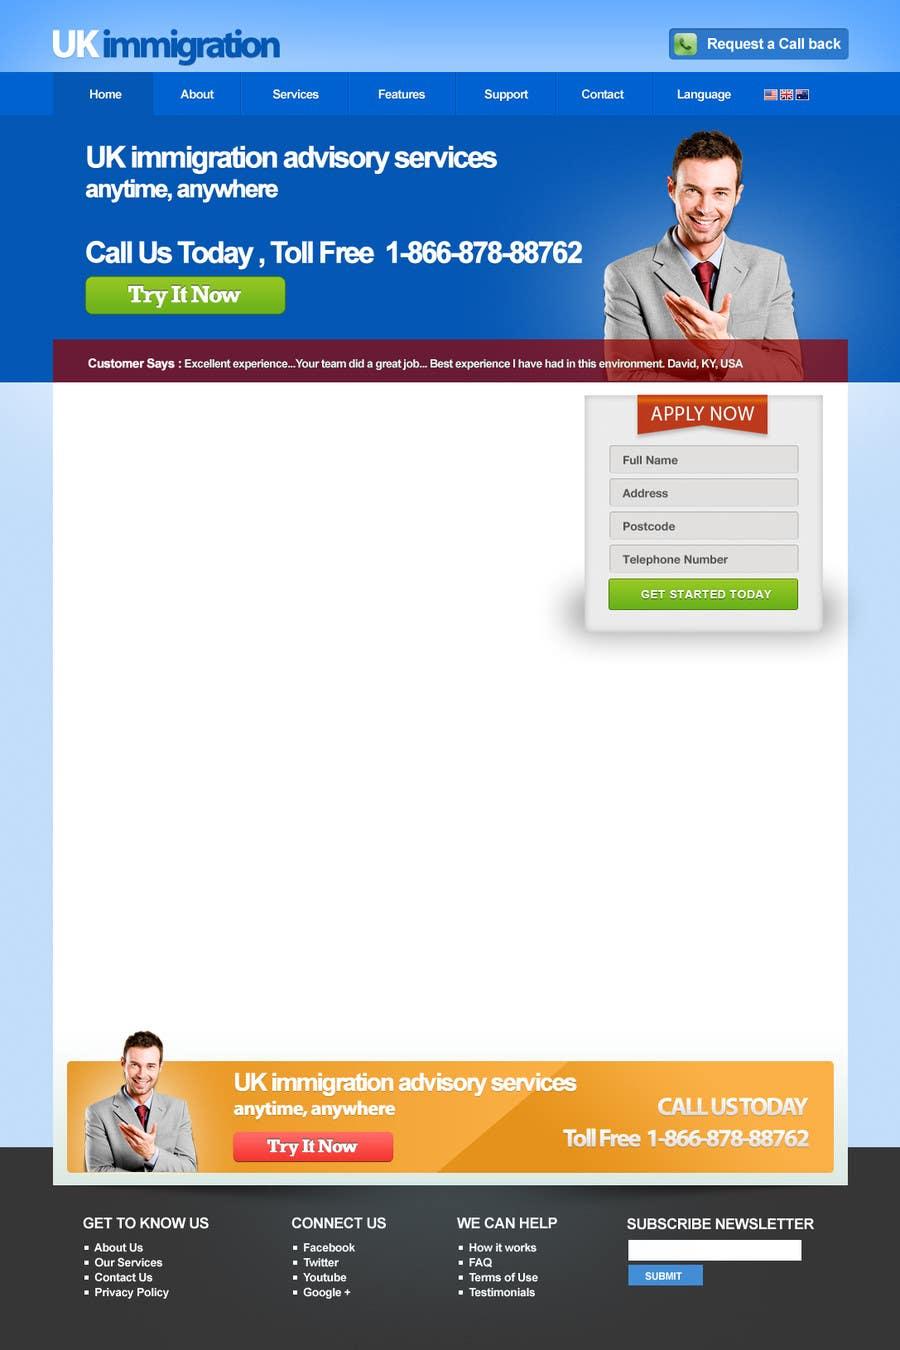 Penyertaan Peraduan #2 untuk Website Design for landing/splash page